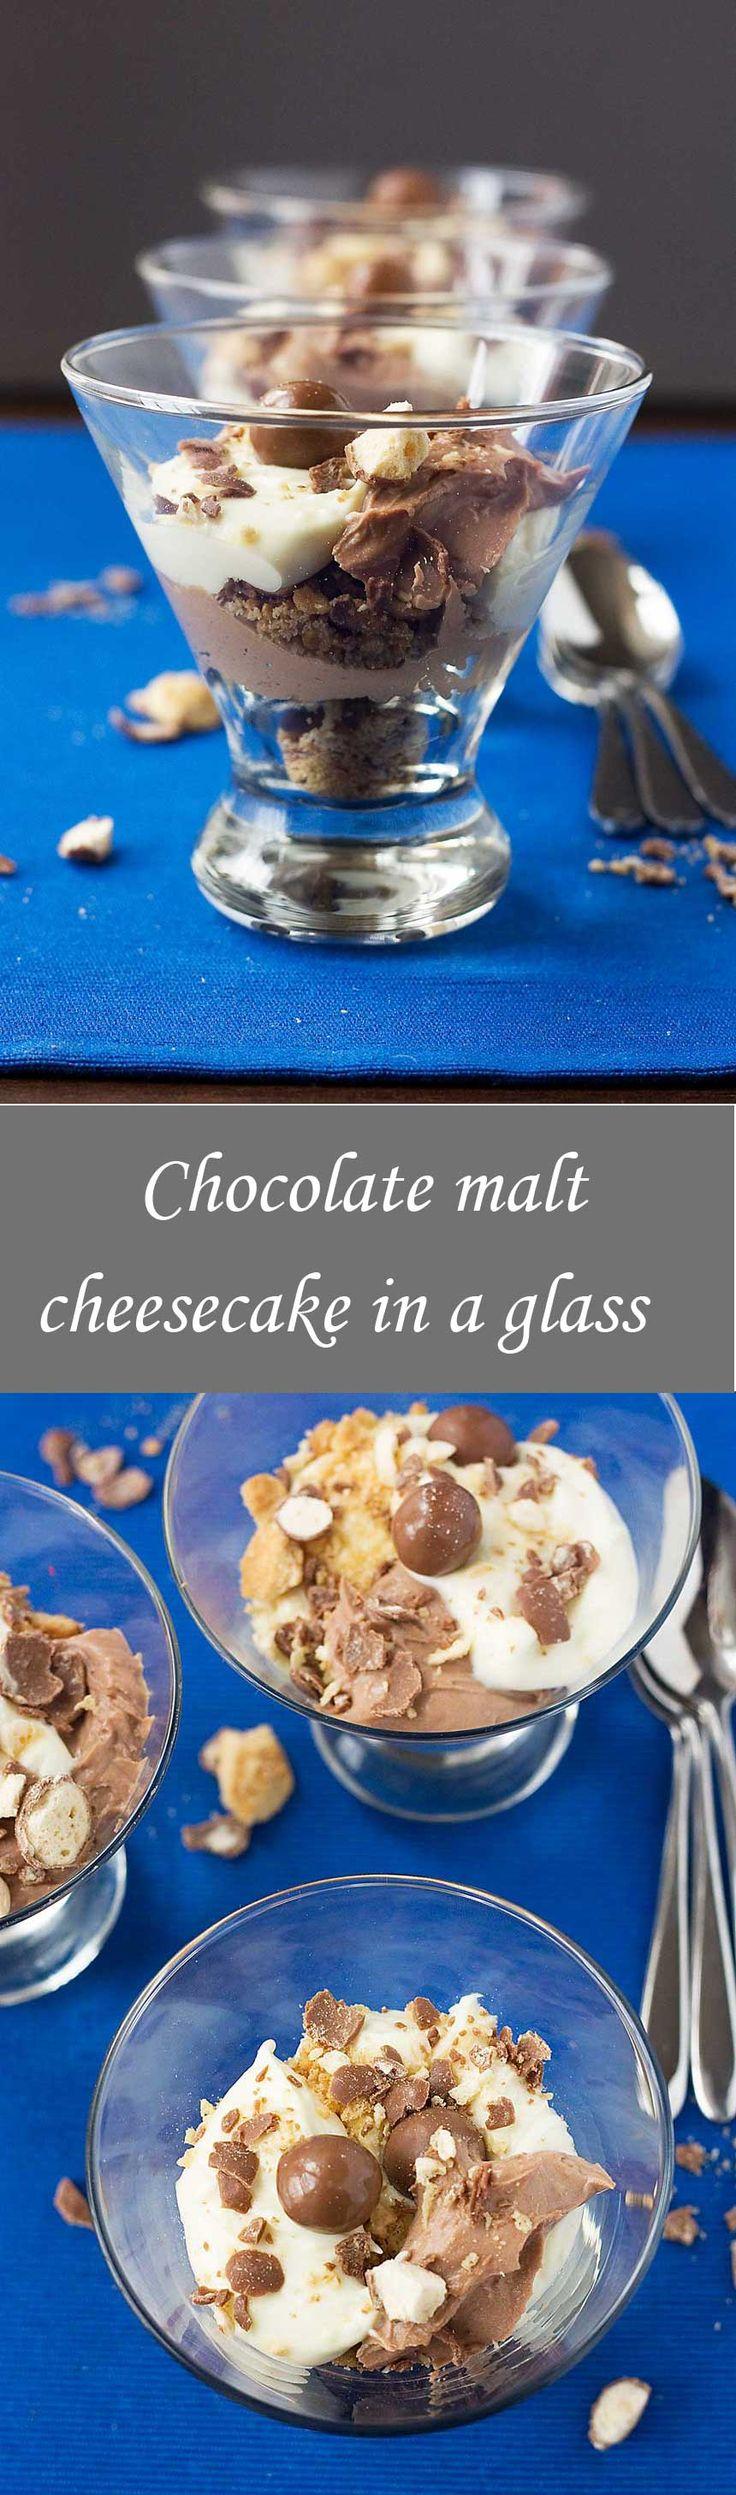 Chocolate malt cheesecake in a glass